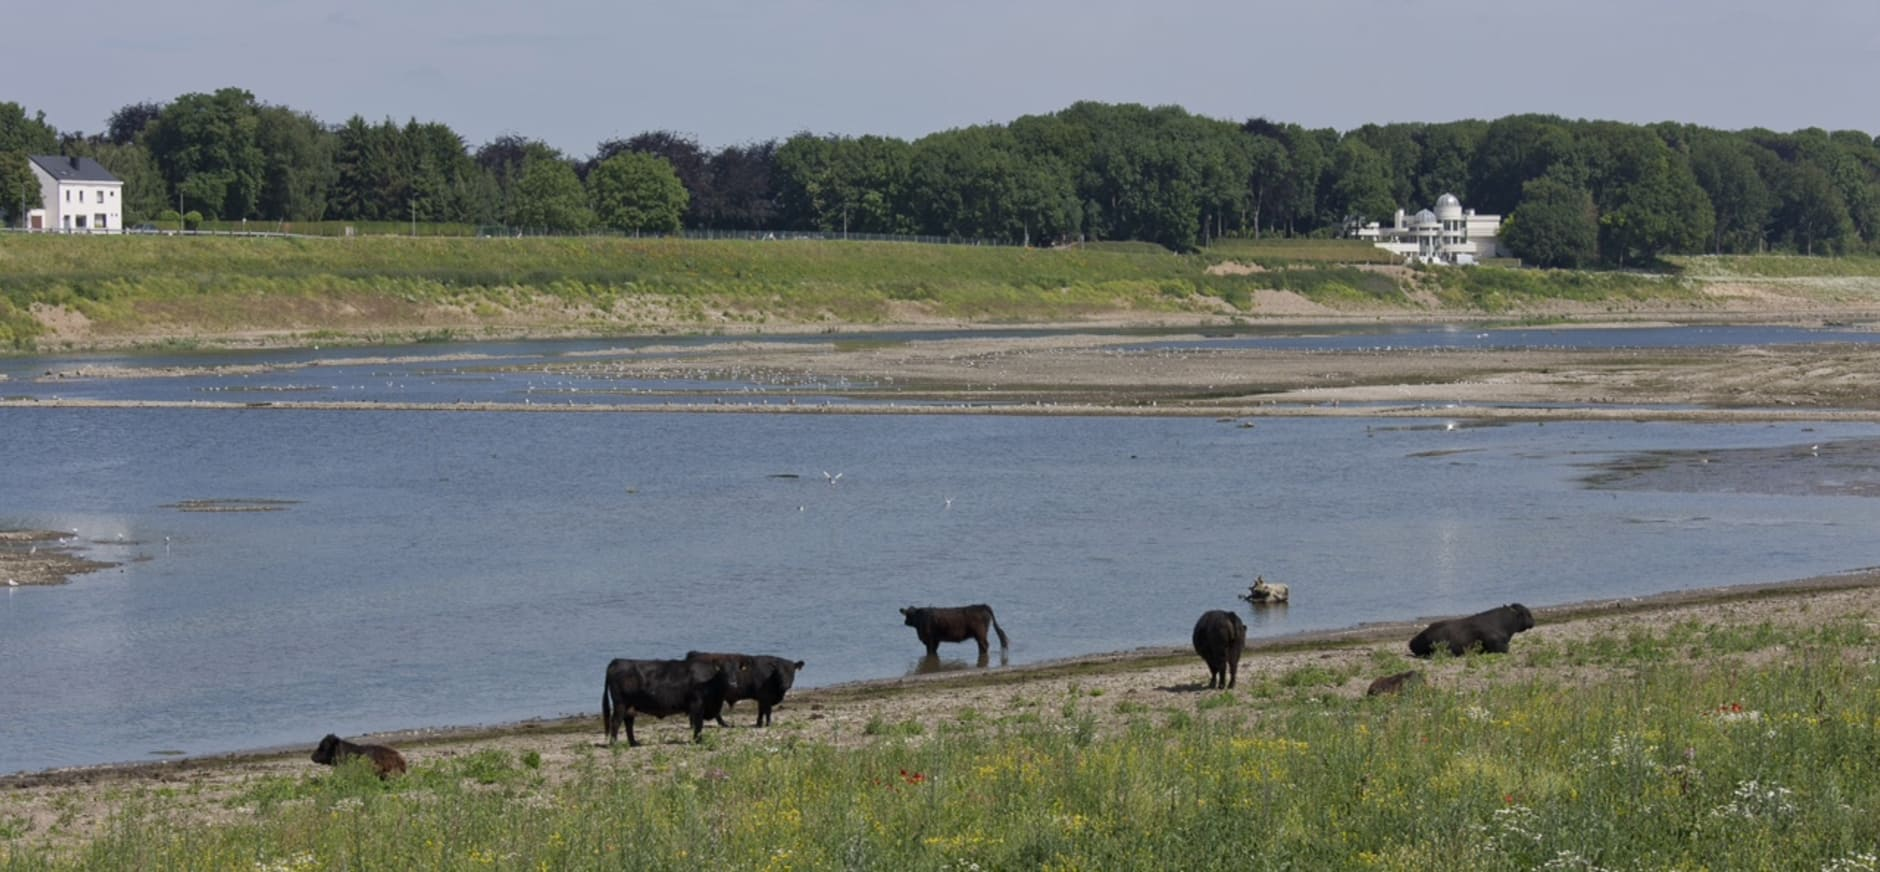 Limburg krijgt natuurgebied van Europese allure